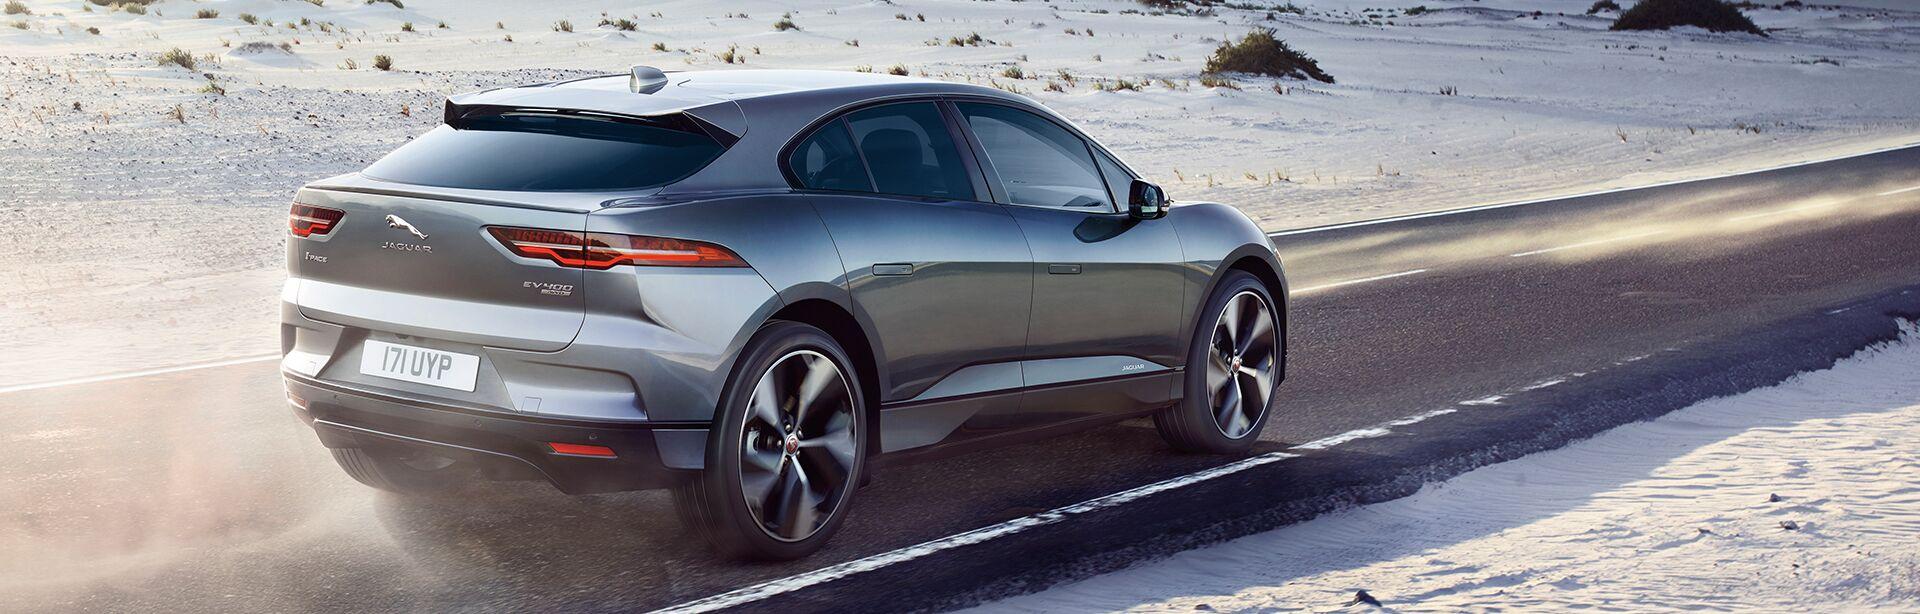 2020 Jaguar I-PACE S AWD